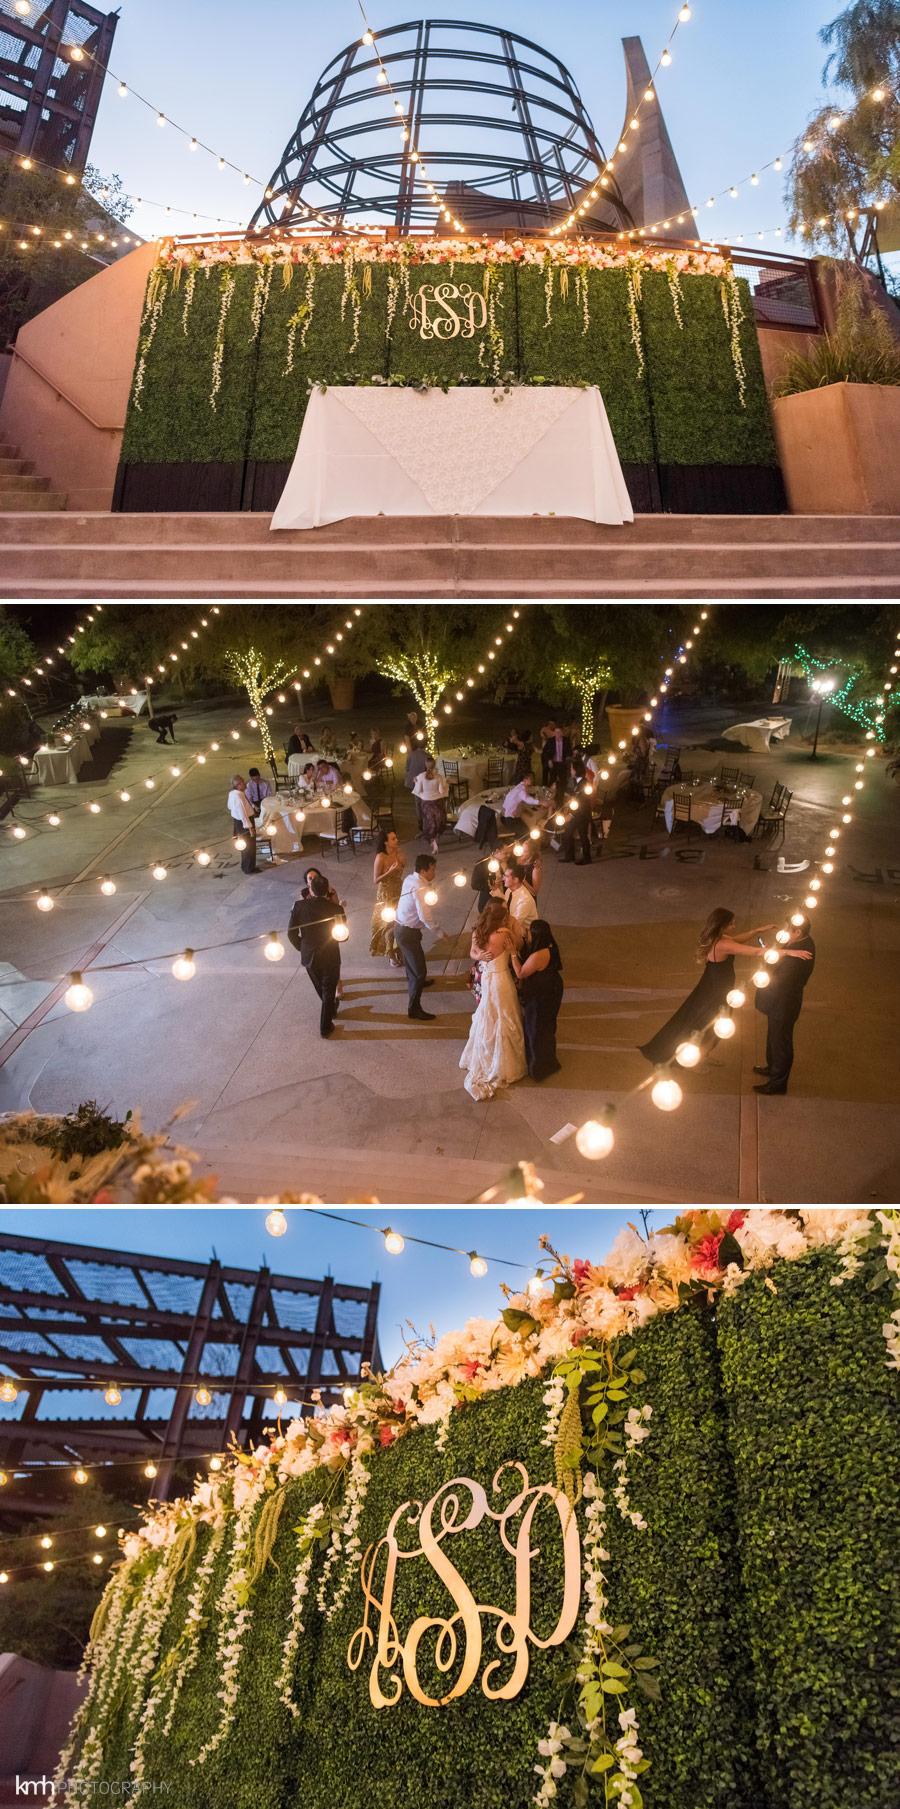 Springs Preserve Las Vegas: Kmh-photography-springs-preserve-las-vegas-wedding-201812